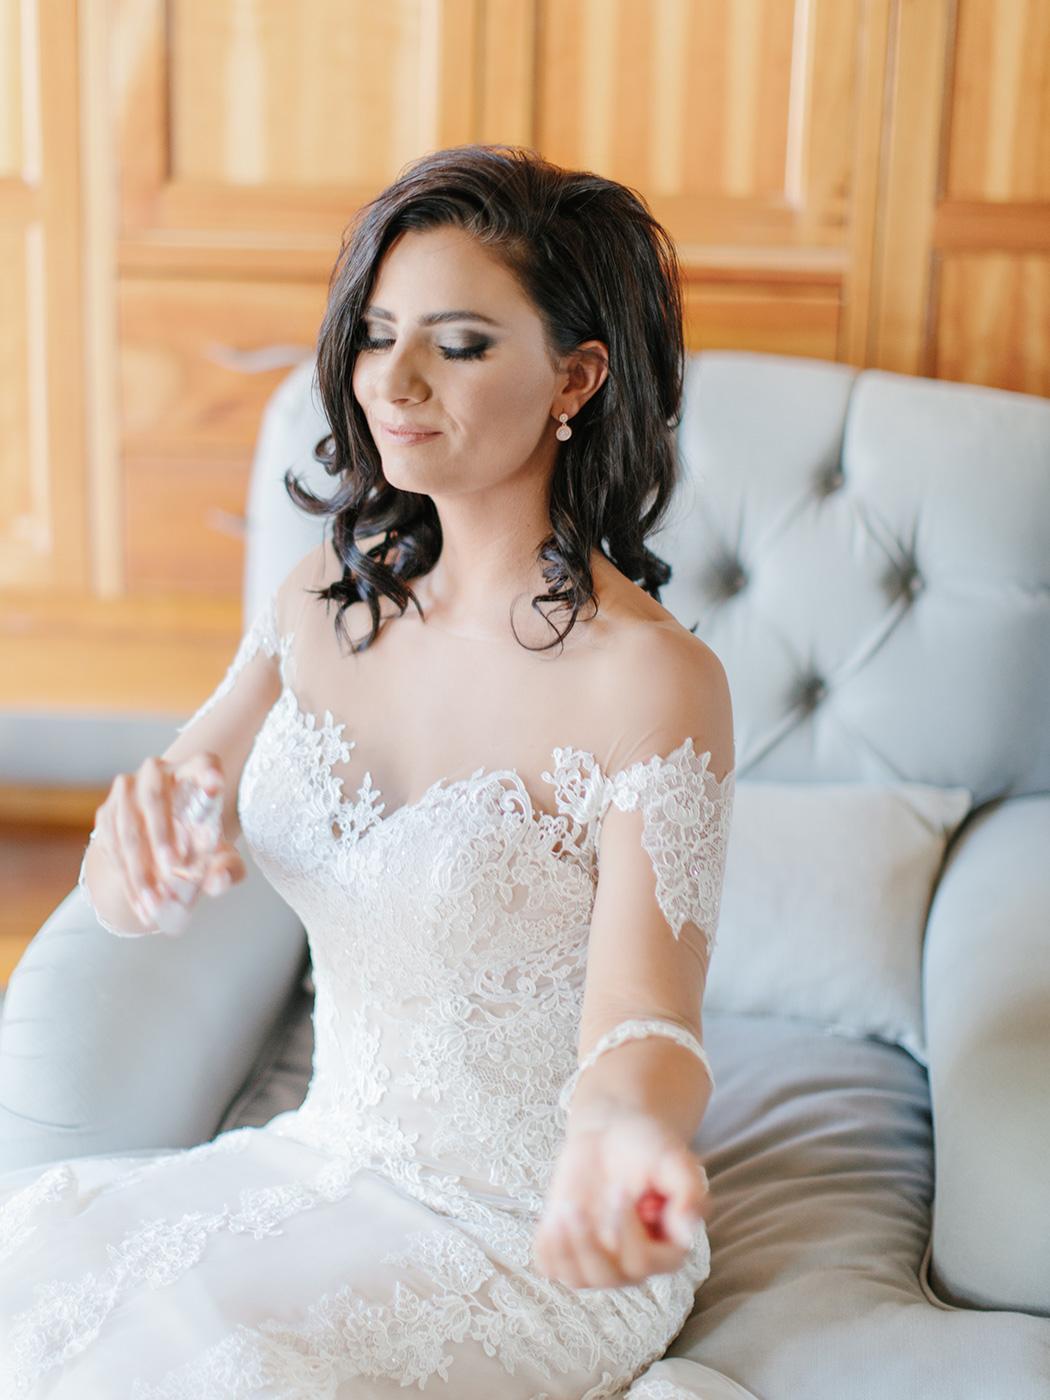 9457b57e21f8 Venue Steenberg Estate   Dress Fe'Amor Bridal Boutique   Make-Up & Hair  Donna Taylor   Jeweler Estelle Lourens Juwele   Flowers To-nett's Flowers &  Decor